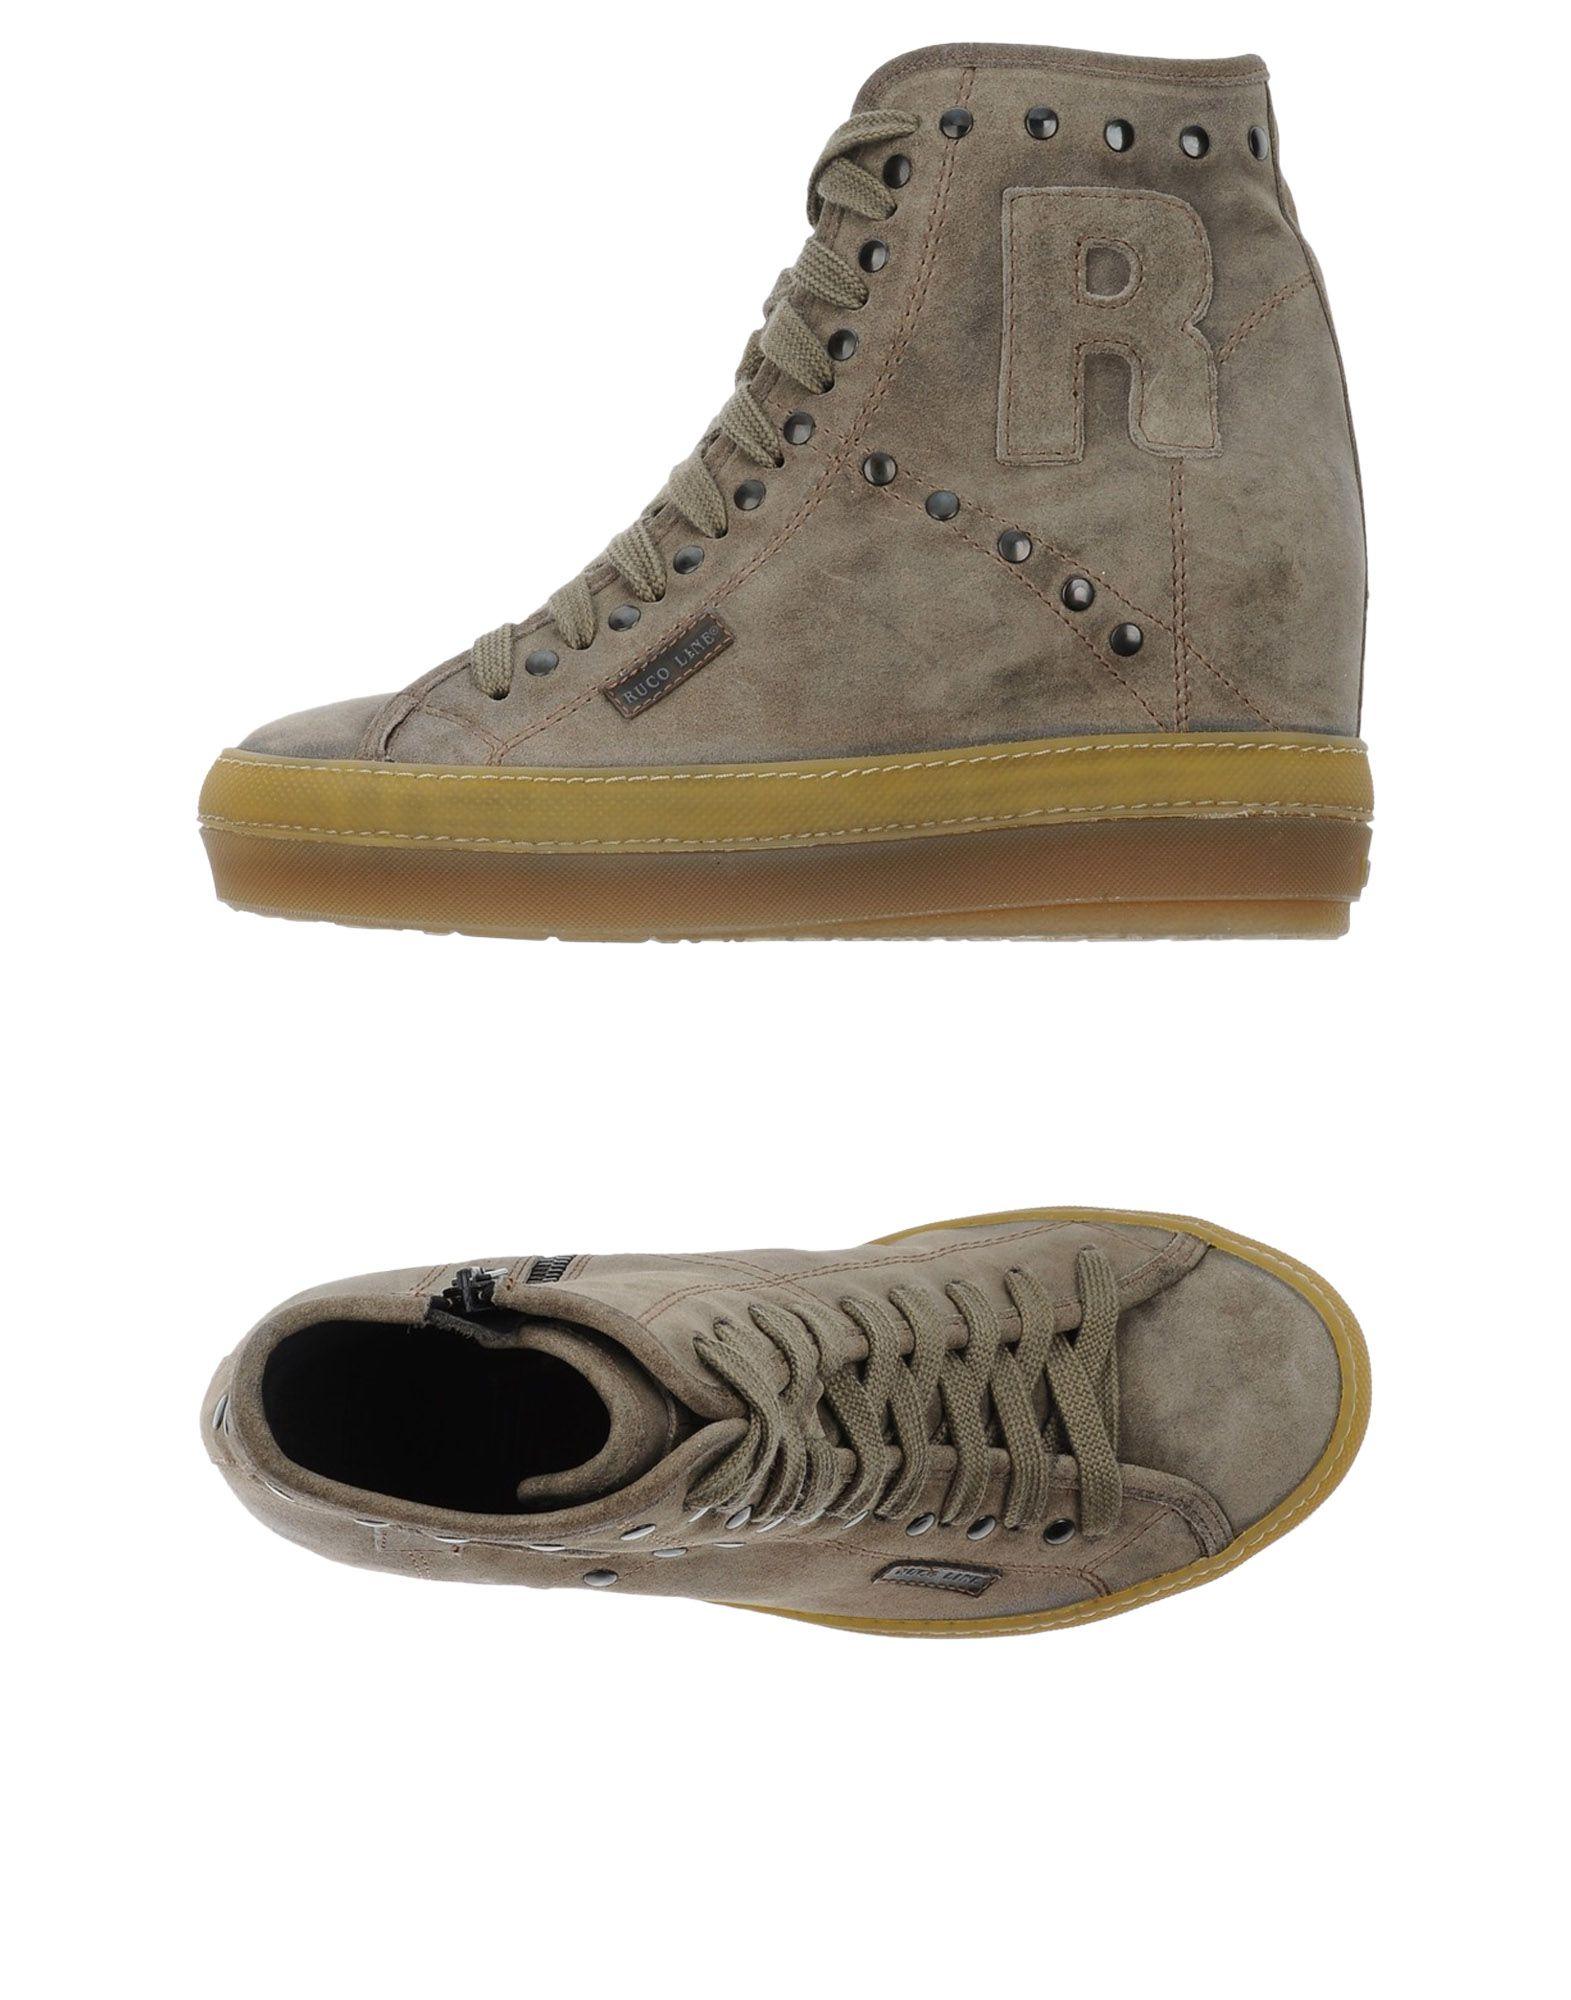 RUCO LINE Высокие кеды и кроссовки кеды кроссовки высокие dc council mid tx stone camo